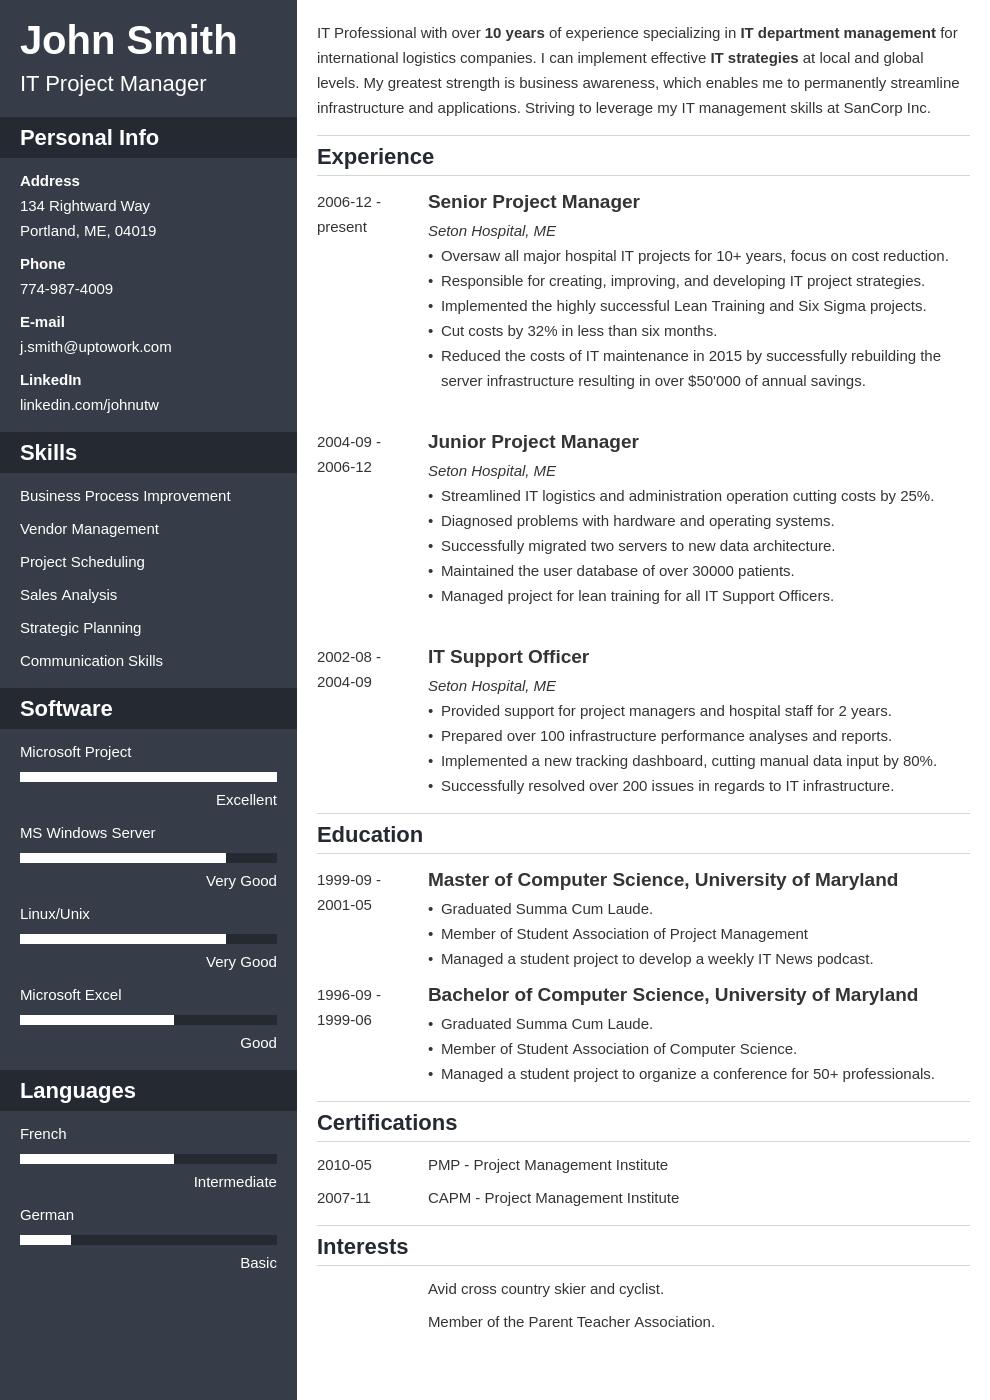 Cv Template Online Resume Format Resume Examples Downloadable Resume Template Resume Templates